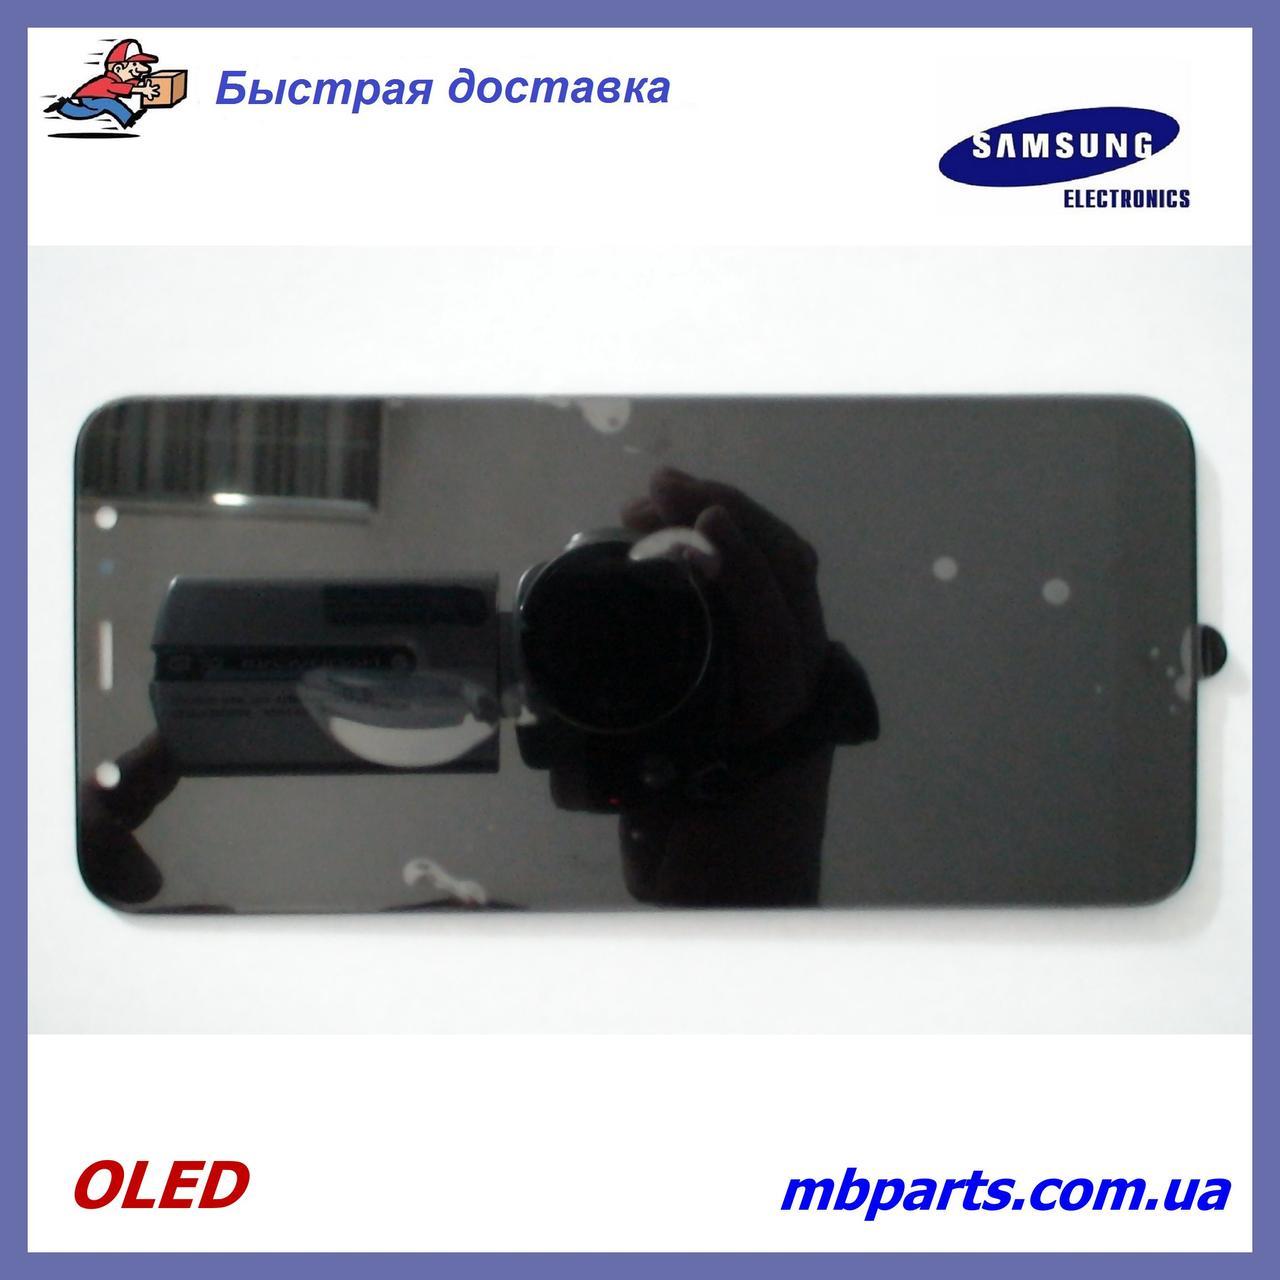 Дисплей з сенсором Samsung A605 Galaxy A6 plus 2018 OLED Black!